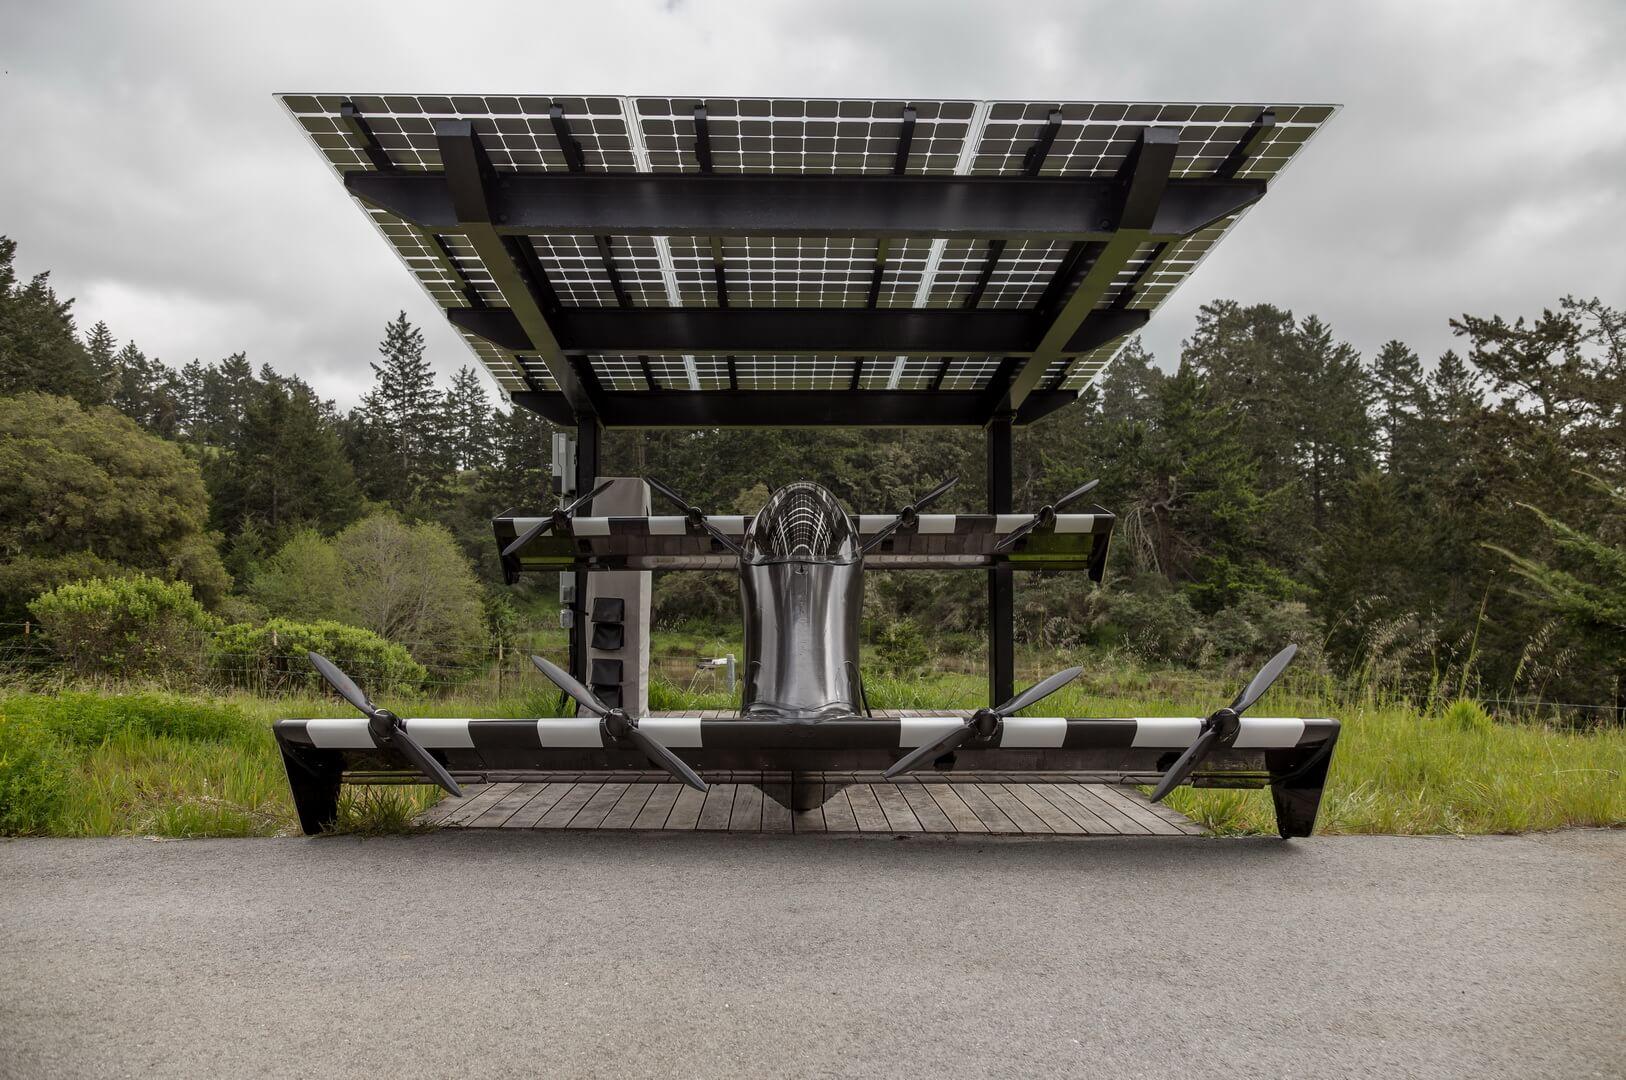 Электрический прототип самолета BlackFly на зарядке от солнечных батарей